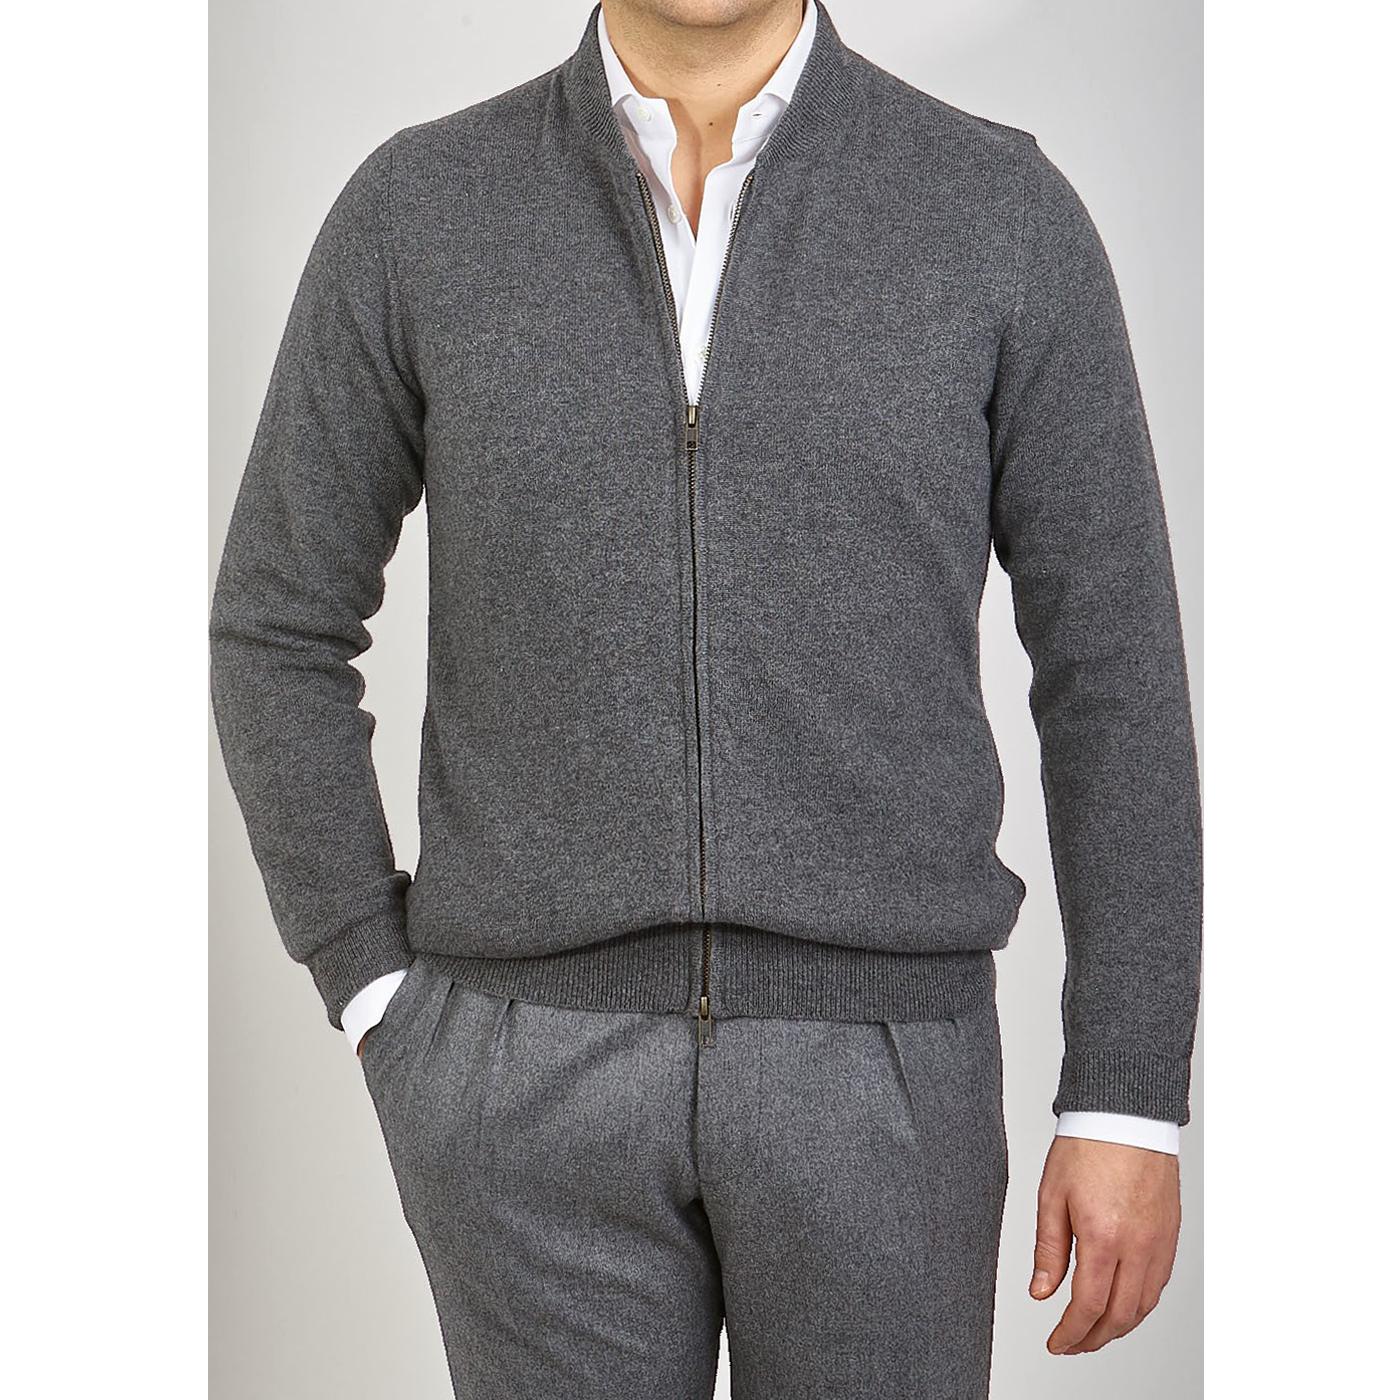 Davida Dark Grey Cashmere Plain Knit Zip Cardigan Front